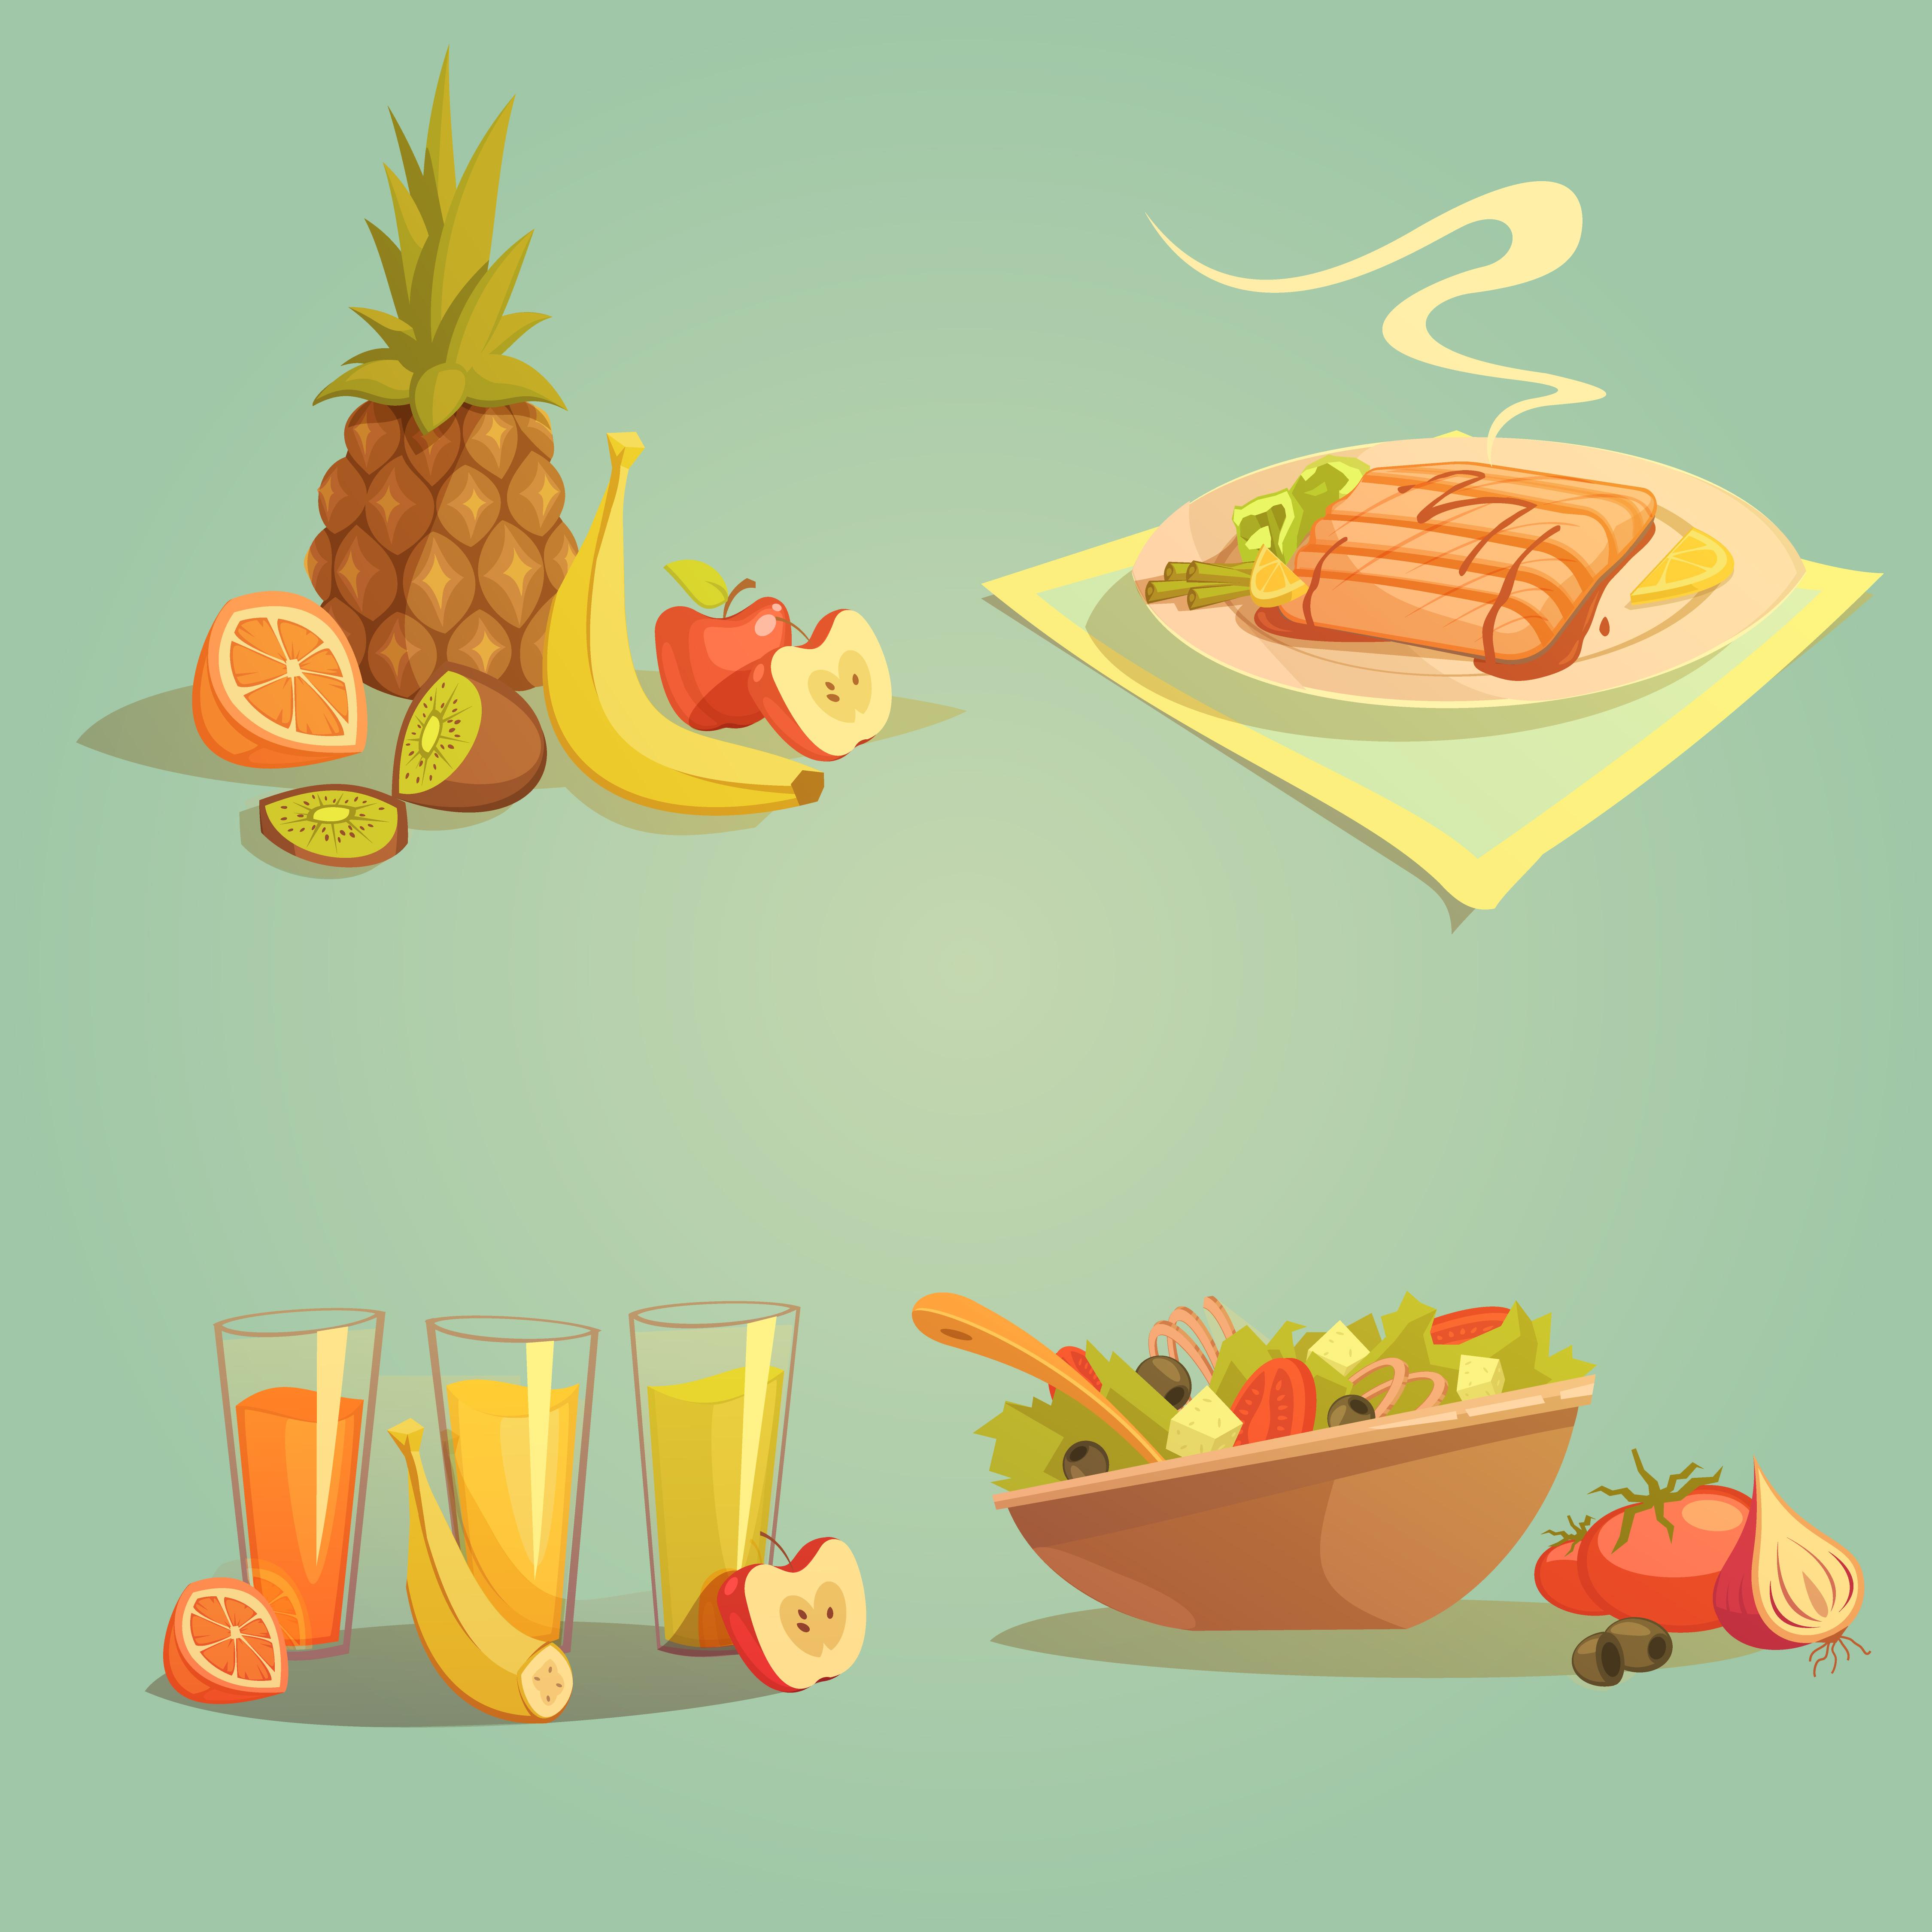 cartoon food healthy drinks vector vecteezy clipart freepik background royalty graphics illustration jemastock